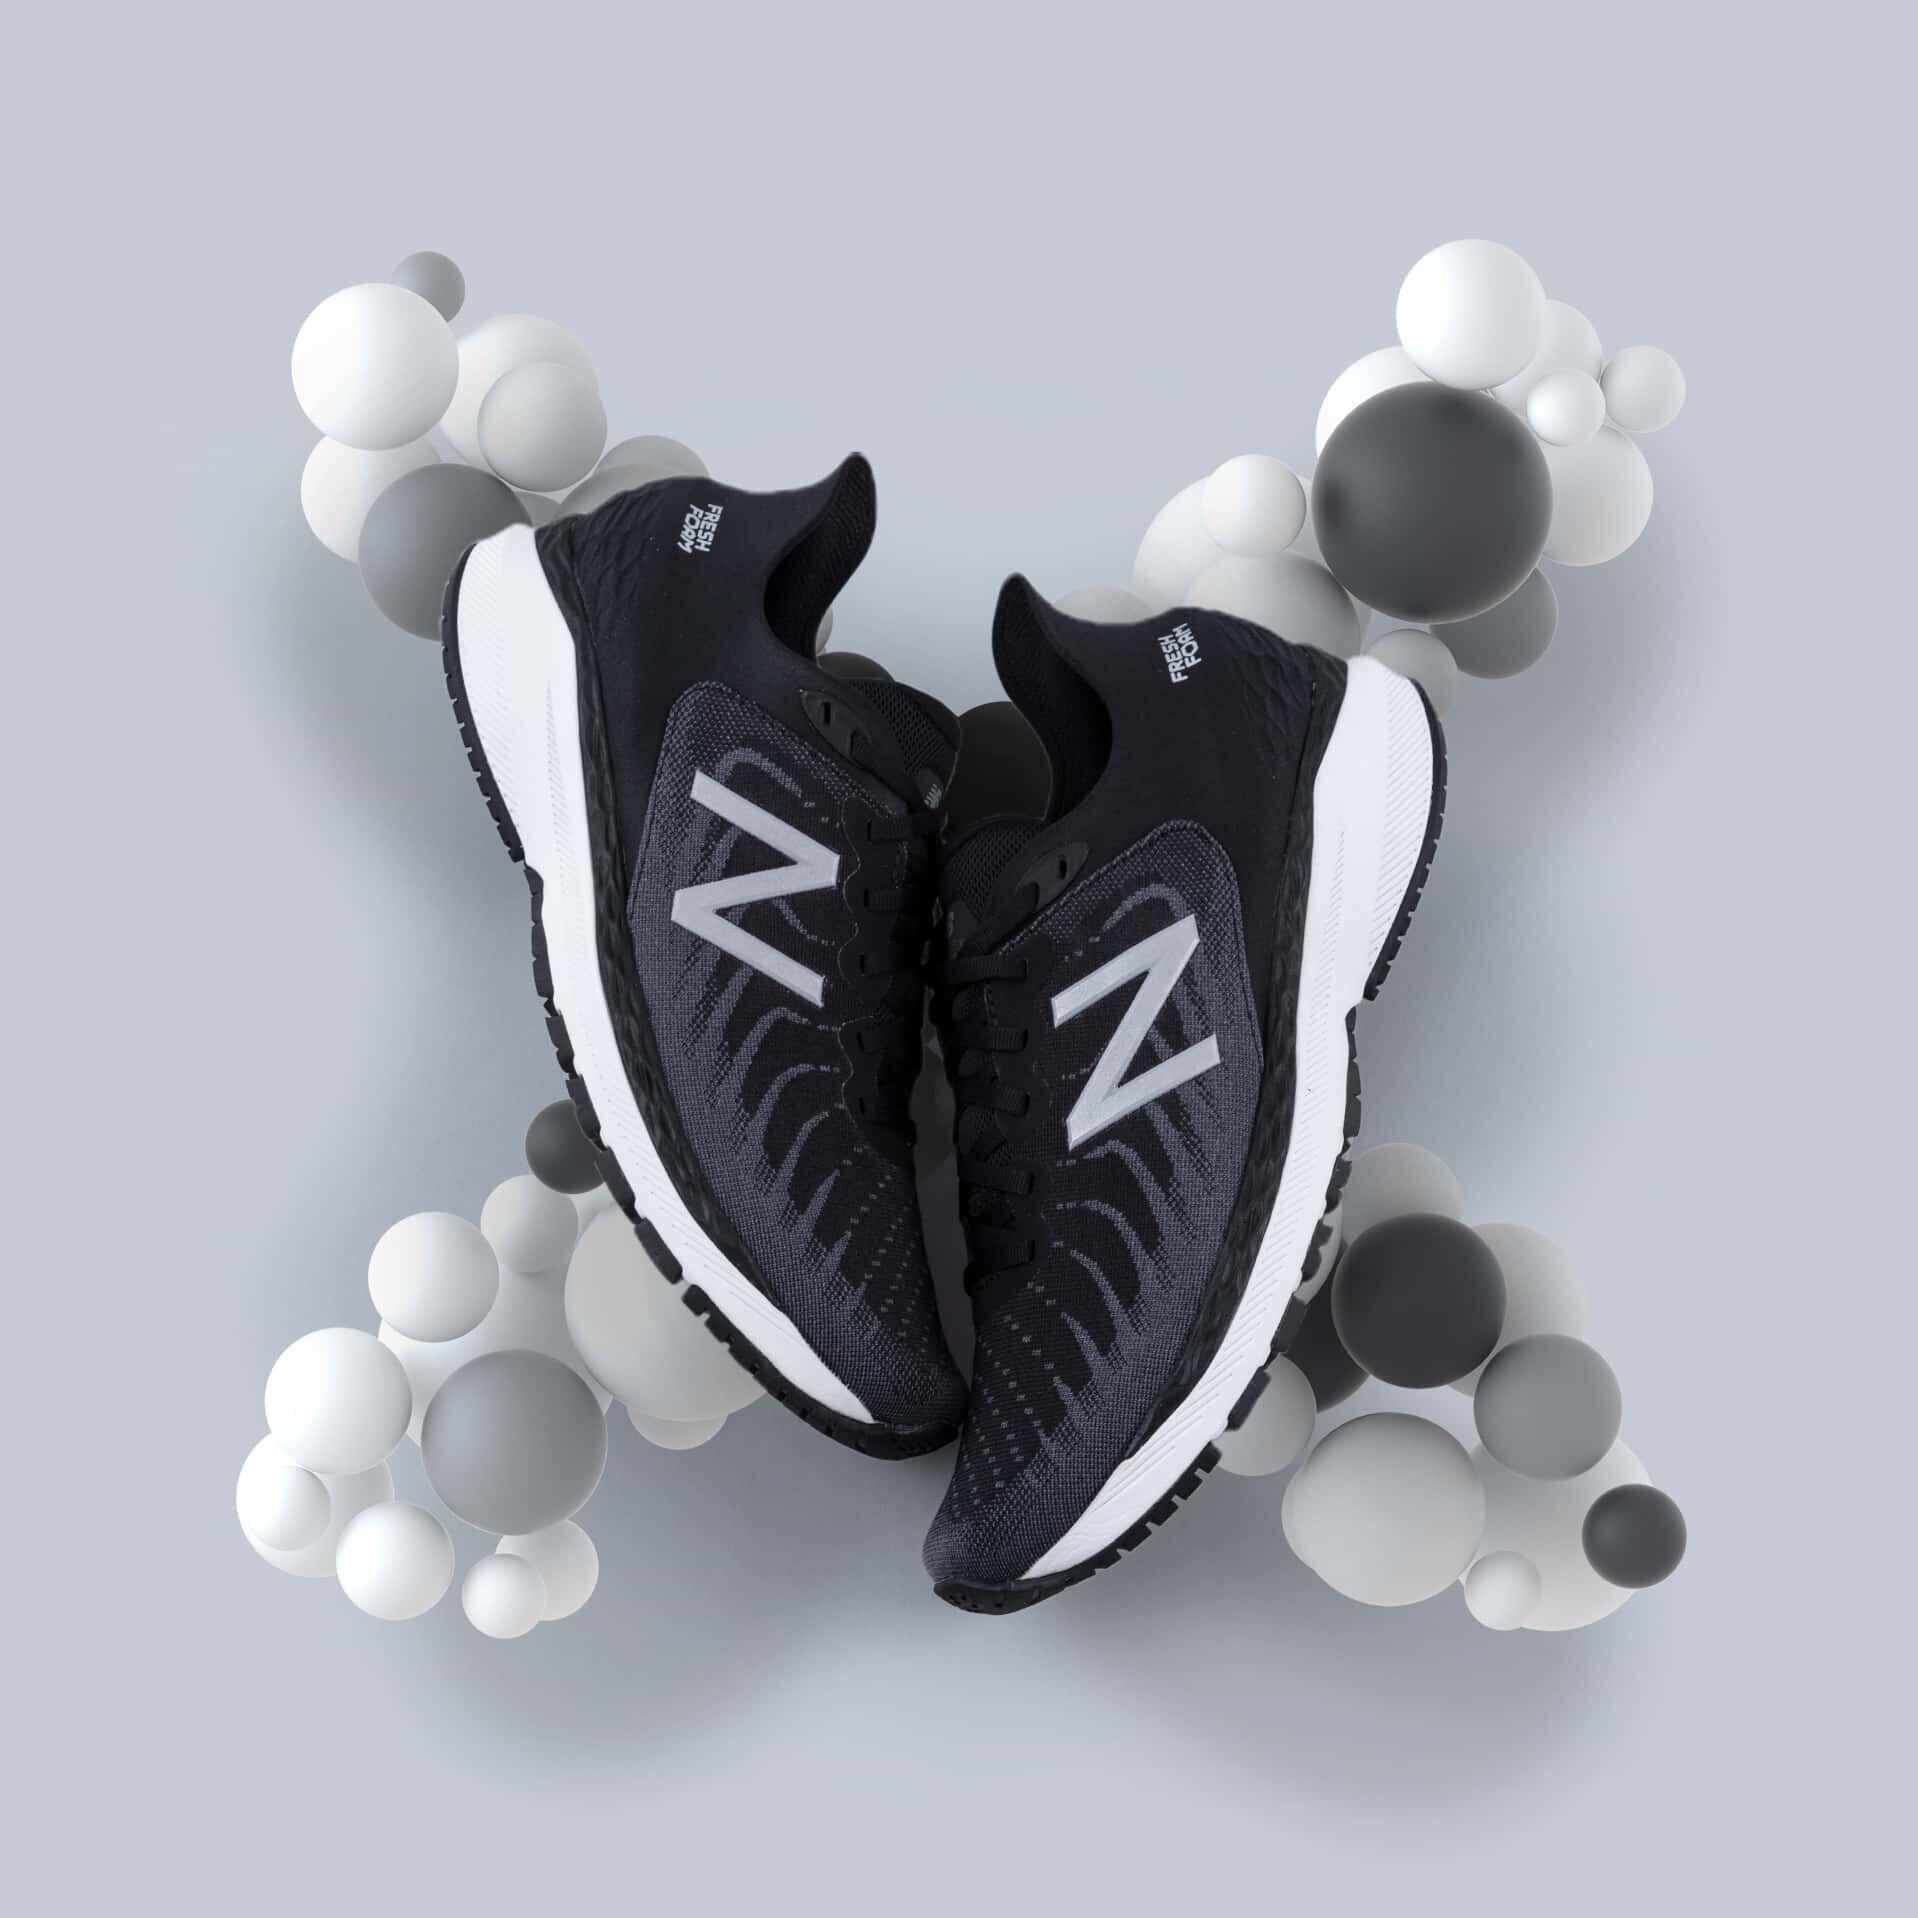 Fresh Foam Running Shoes - New Balance